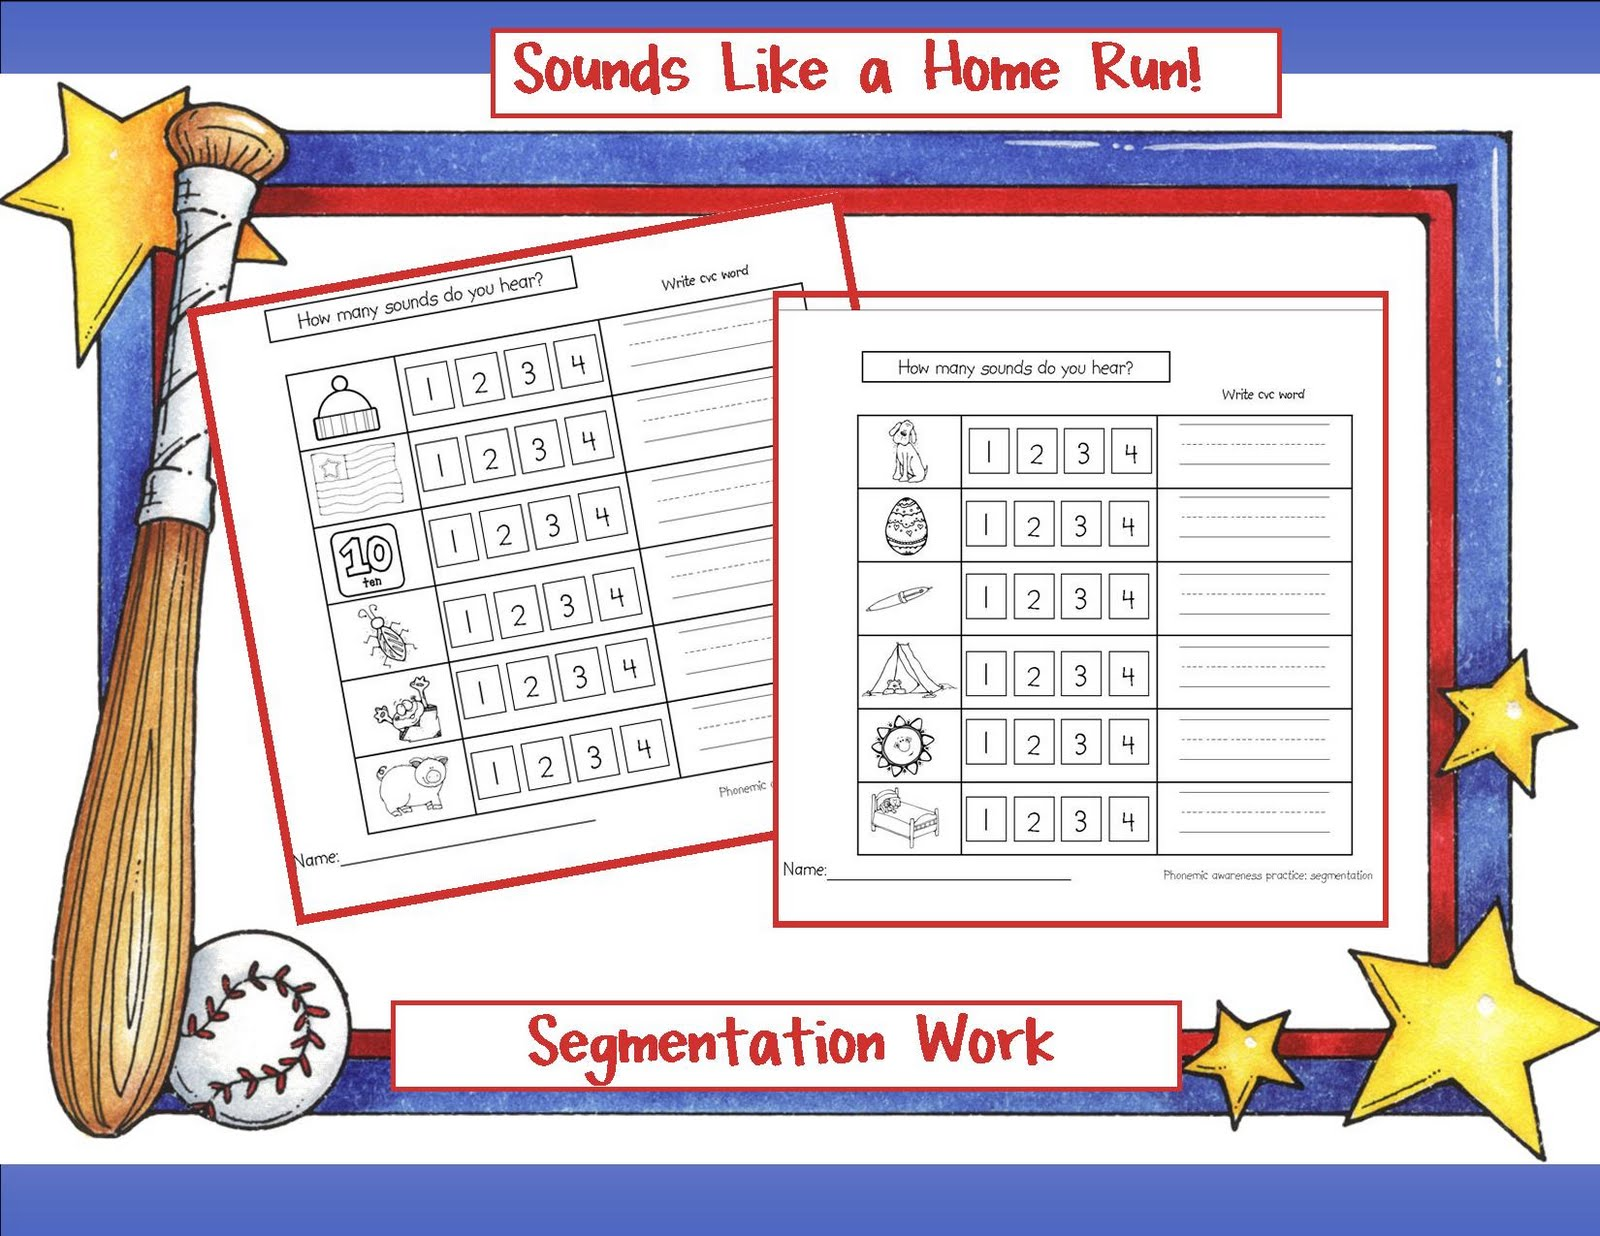 Kindergarten Crayons Segmentation Or Aggravation